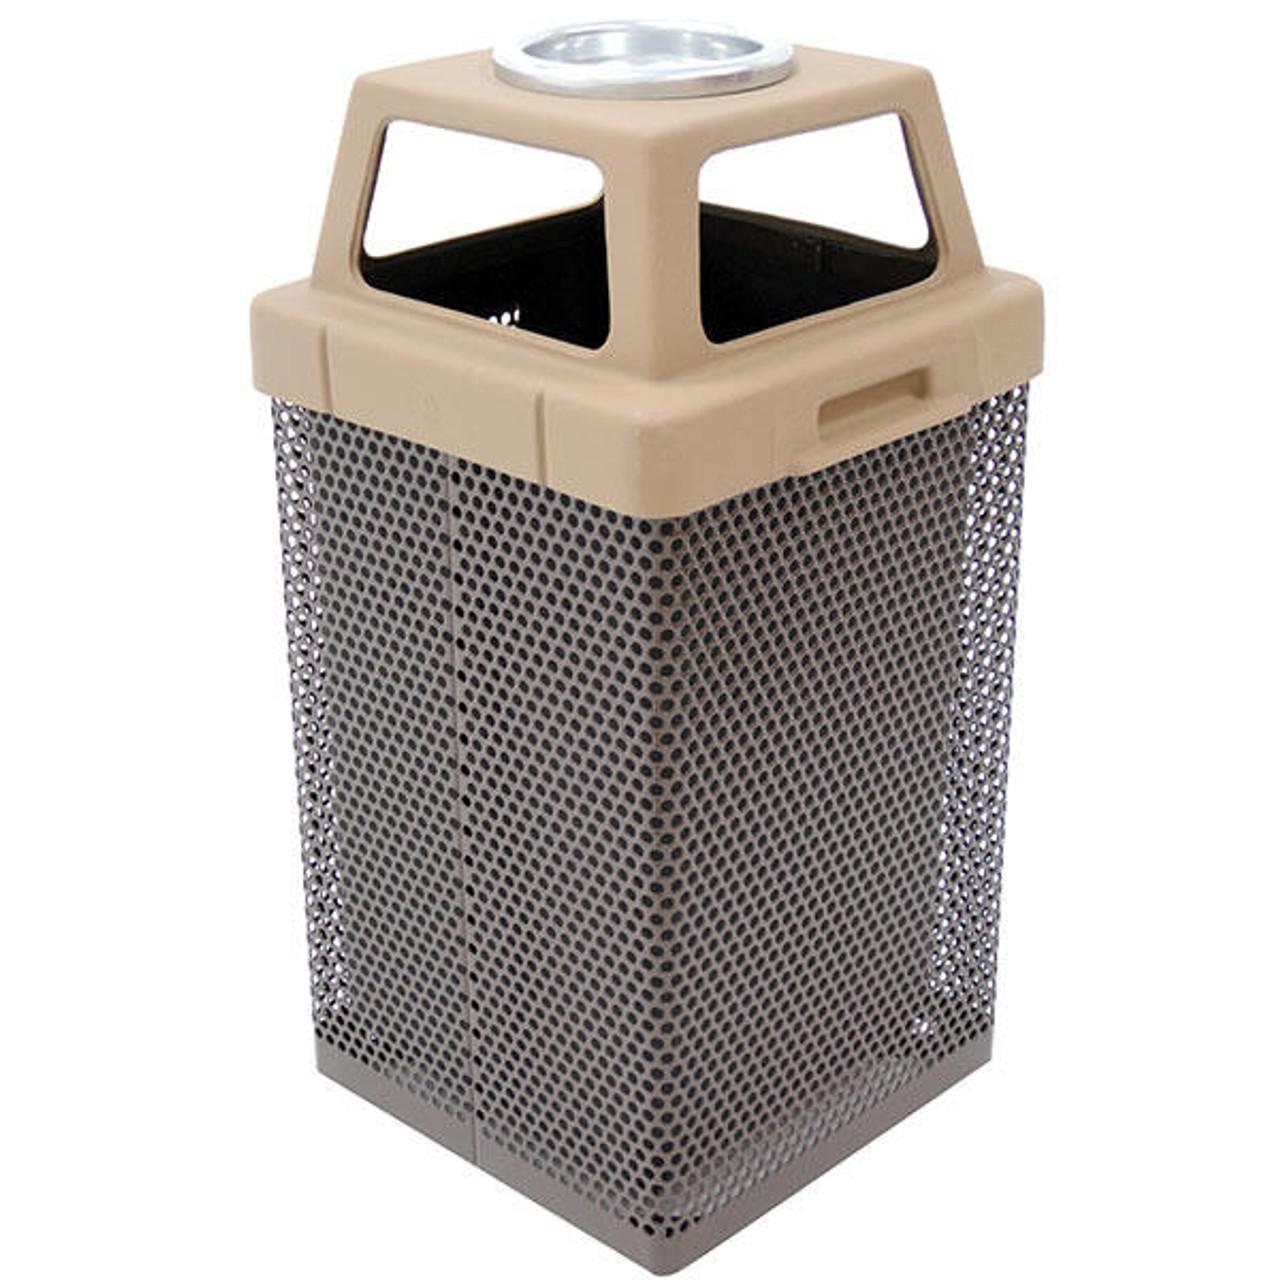 38 Gallon 4 Way Open Top Lid Outdoor Ash Trash Container MF3054